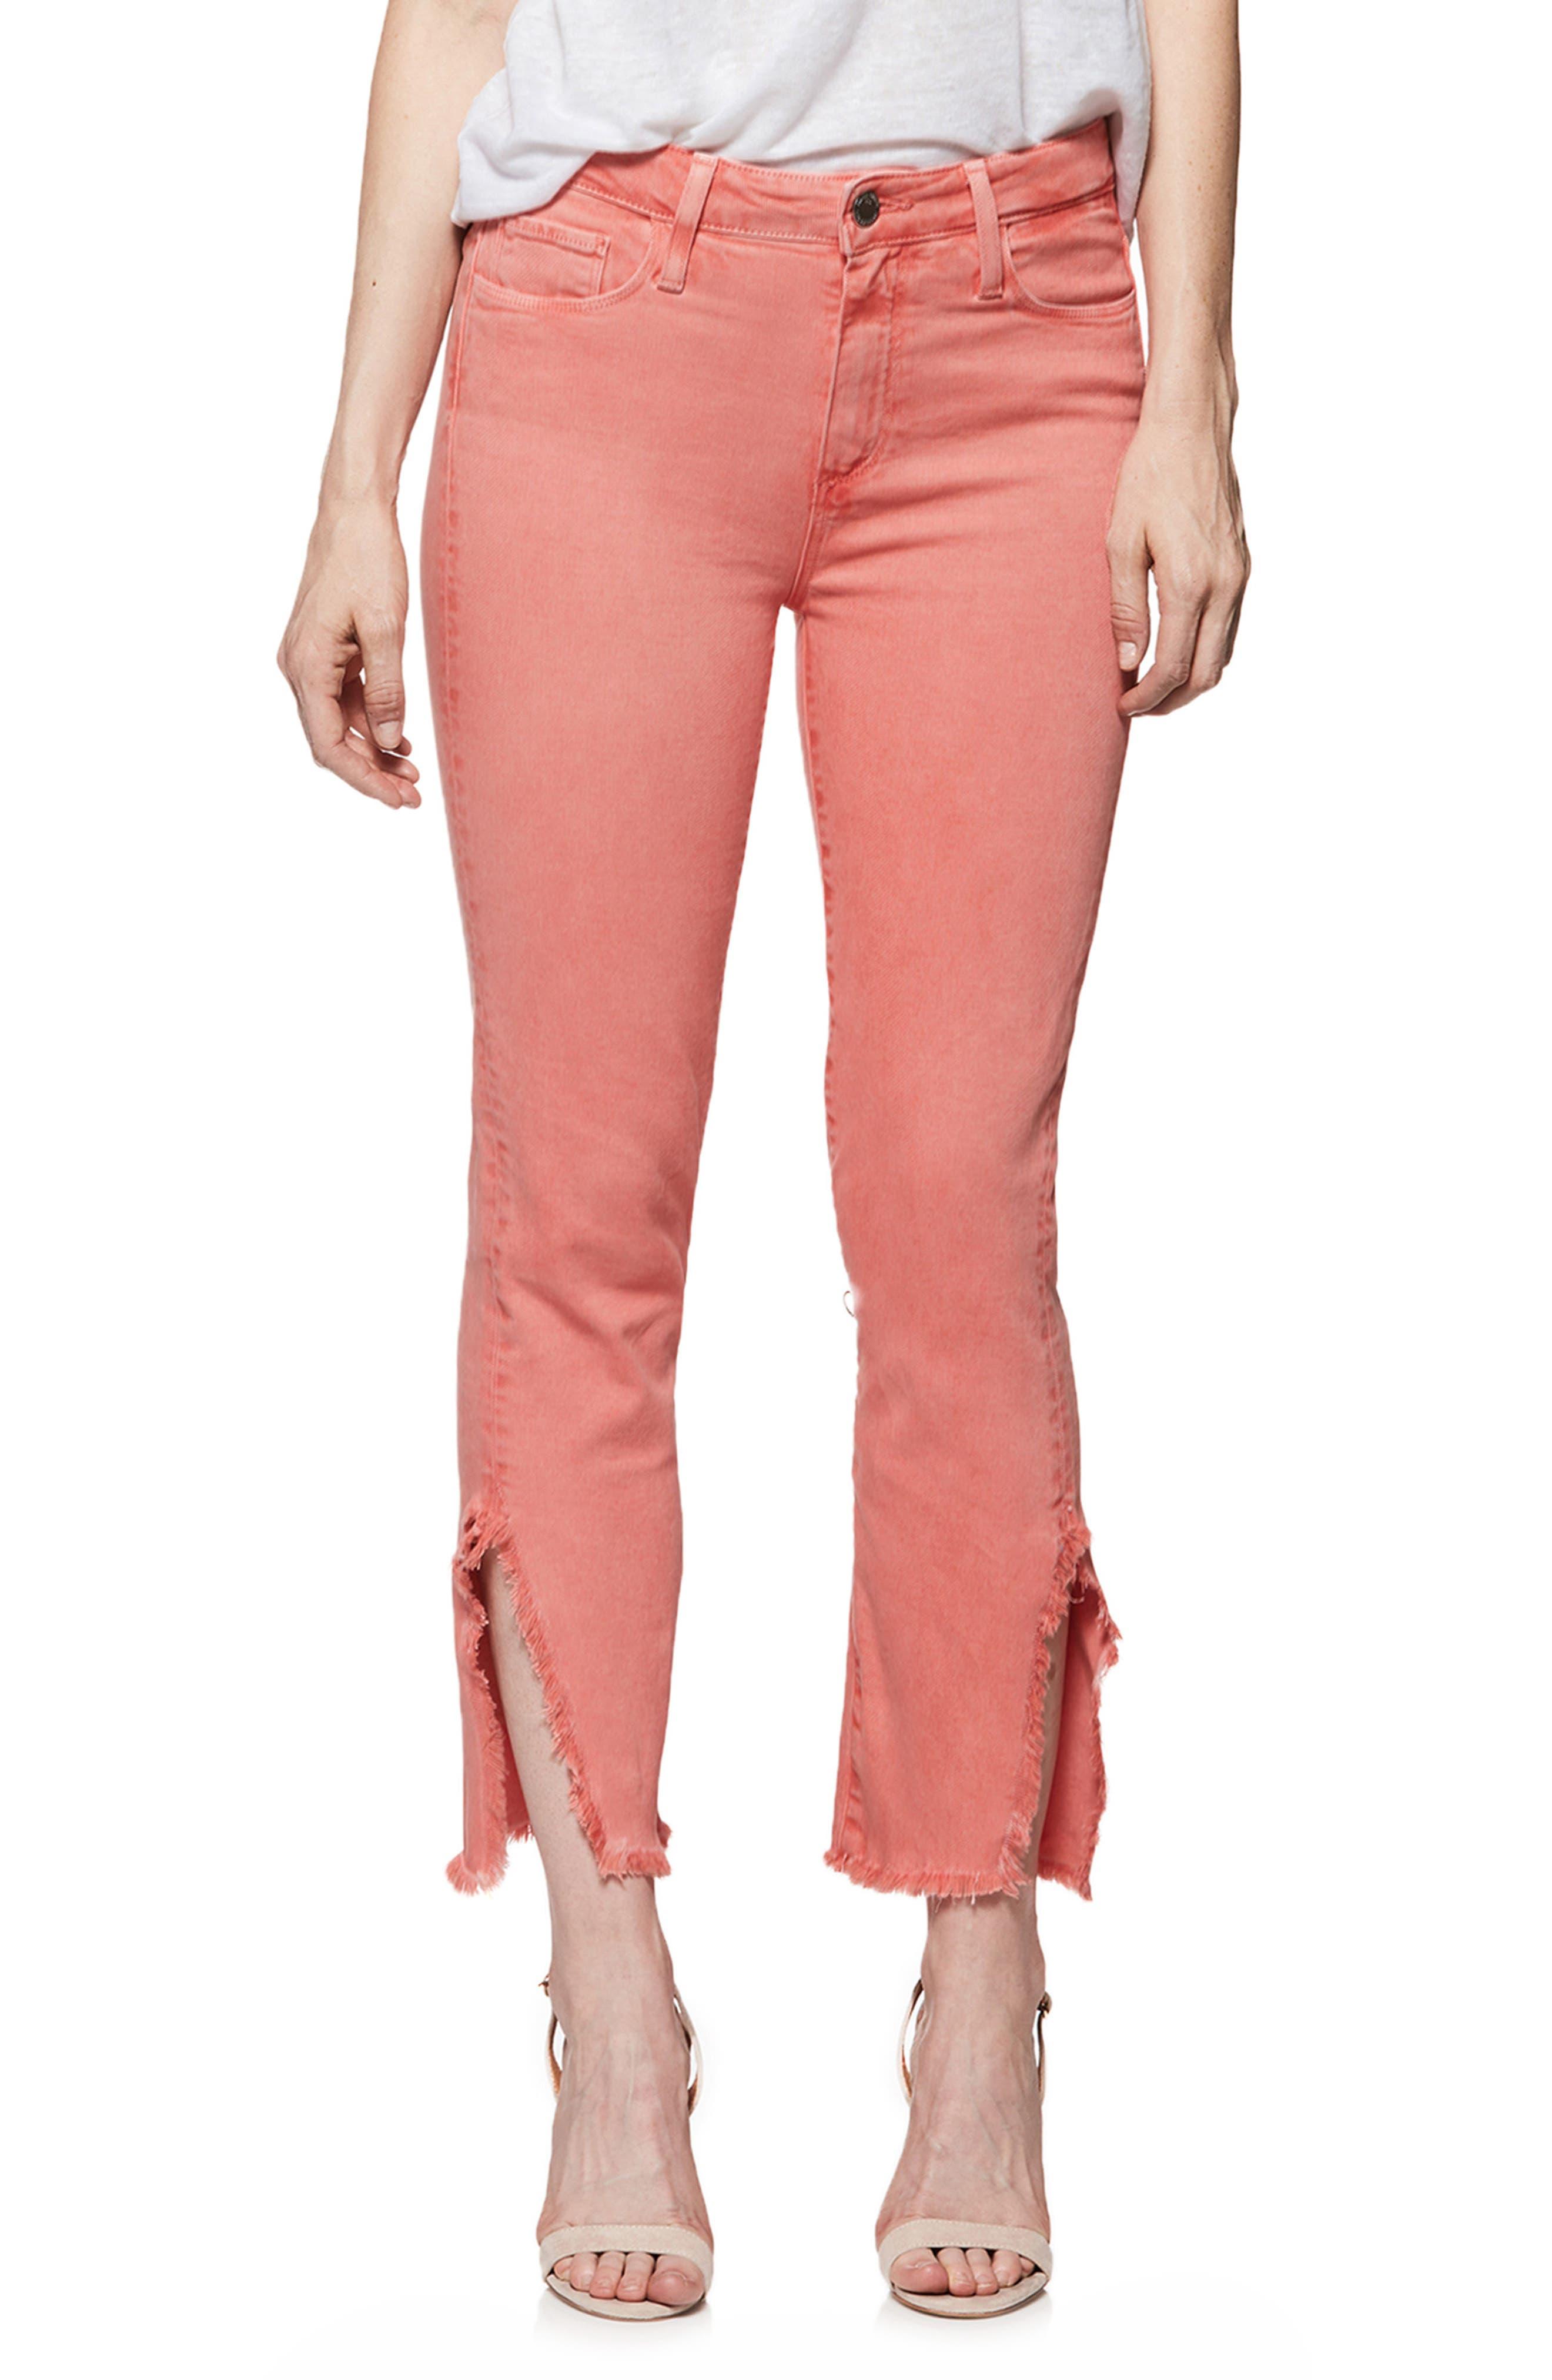 Hoxton High Waist Slit Hem Ankle Straight Jeans,                         Main,                         color, Vintage Coral Reef